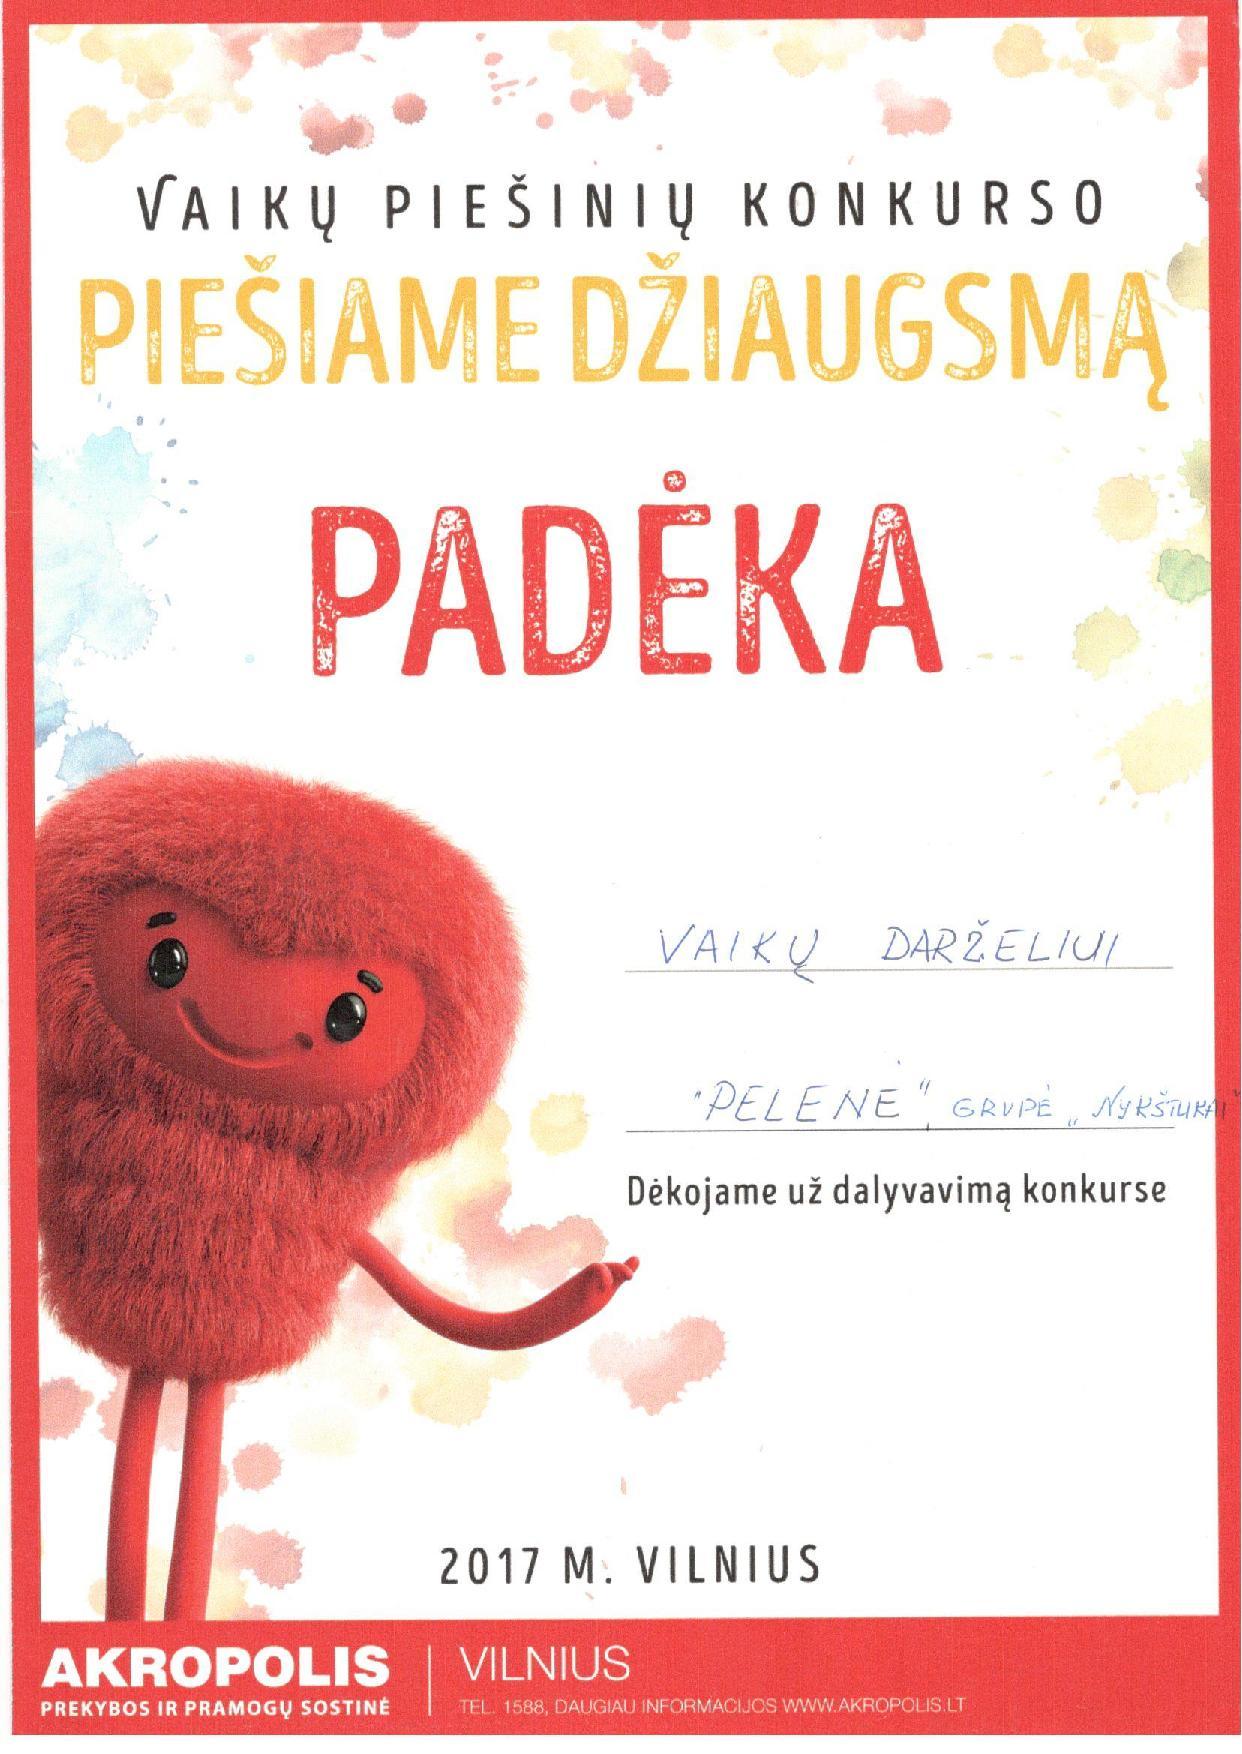 2017 Piesiame Dziaugsma PADEKA